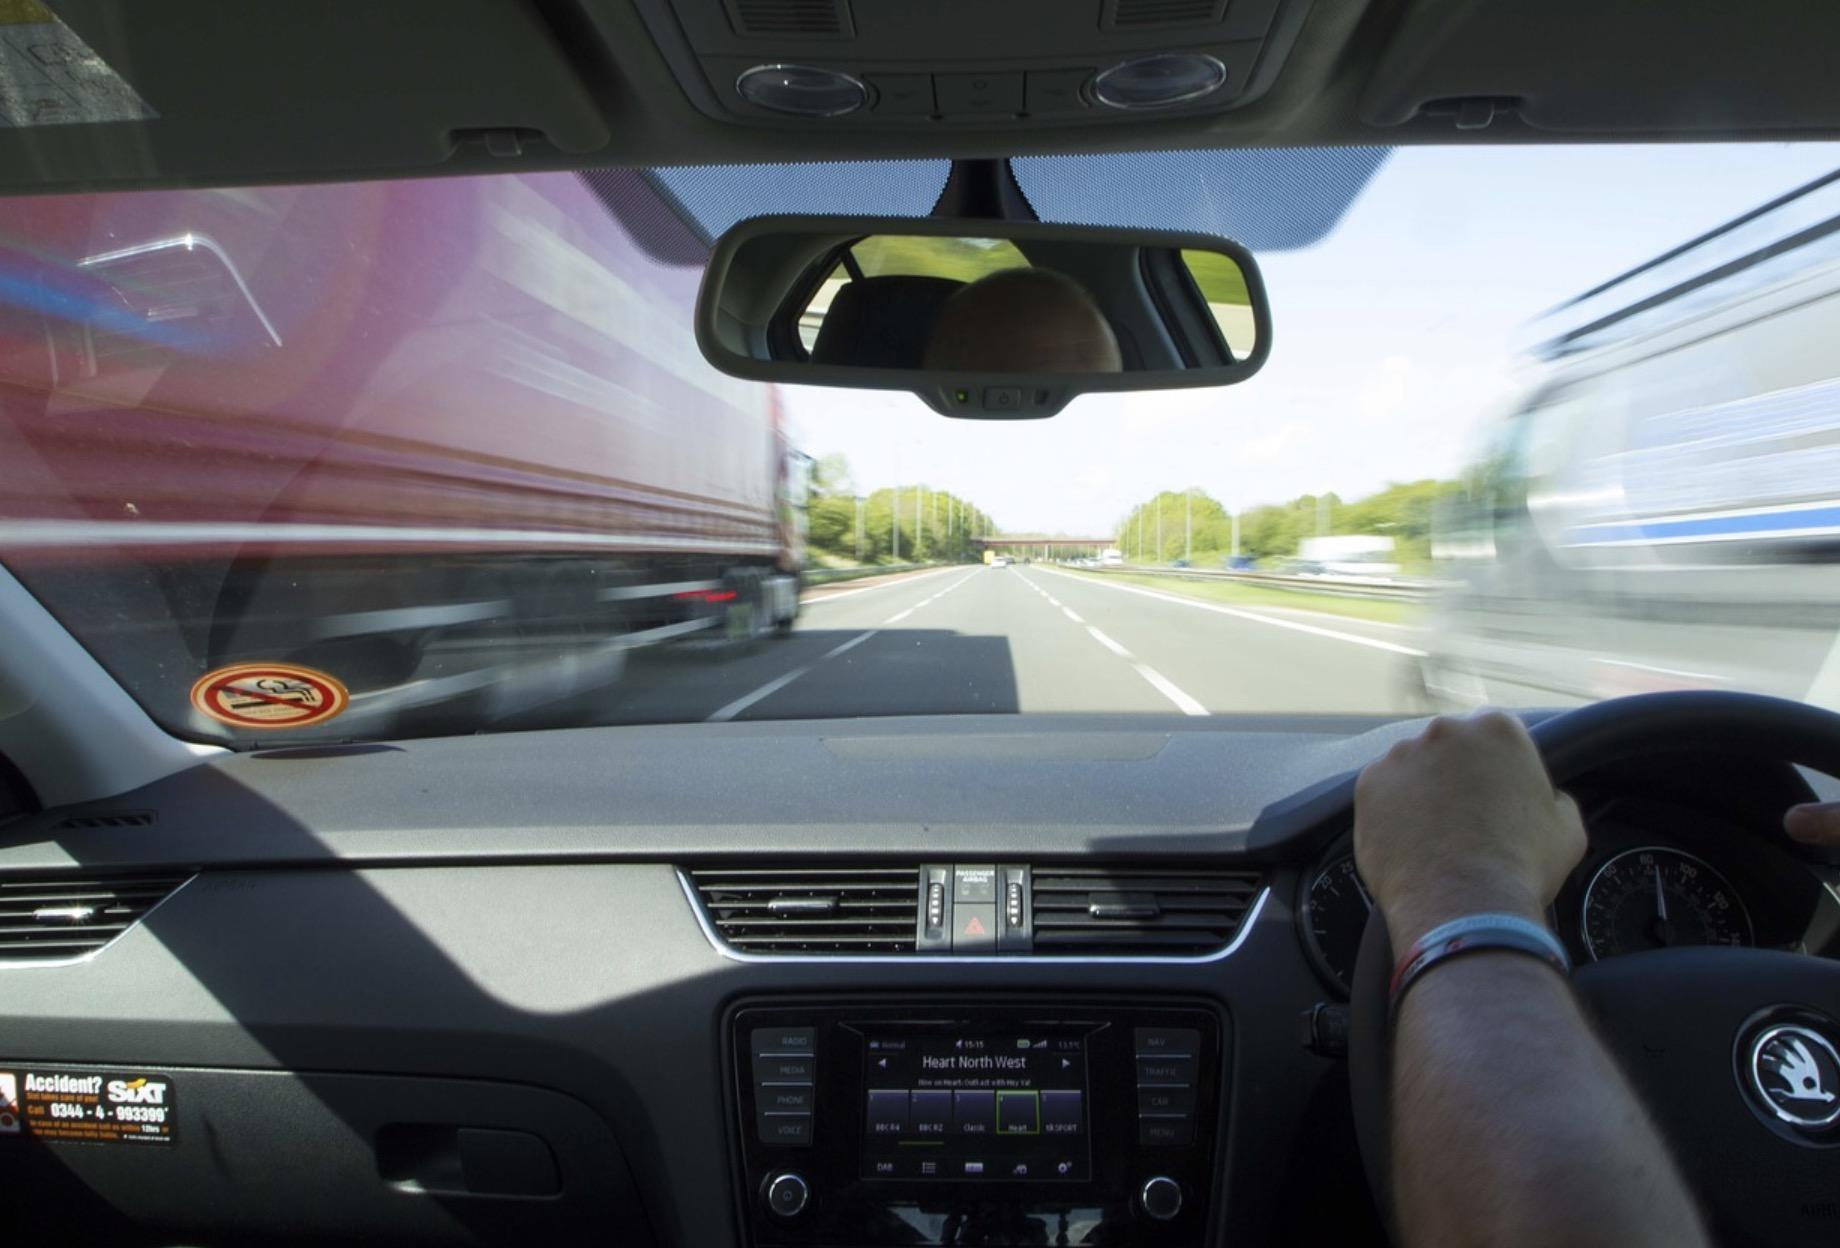 Autobahn hastighed